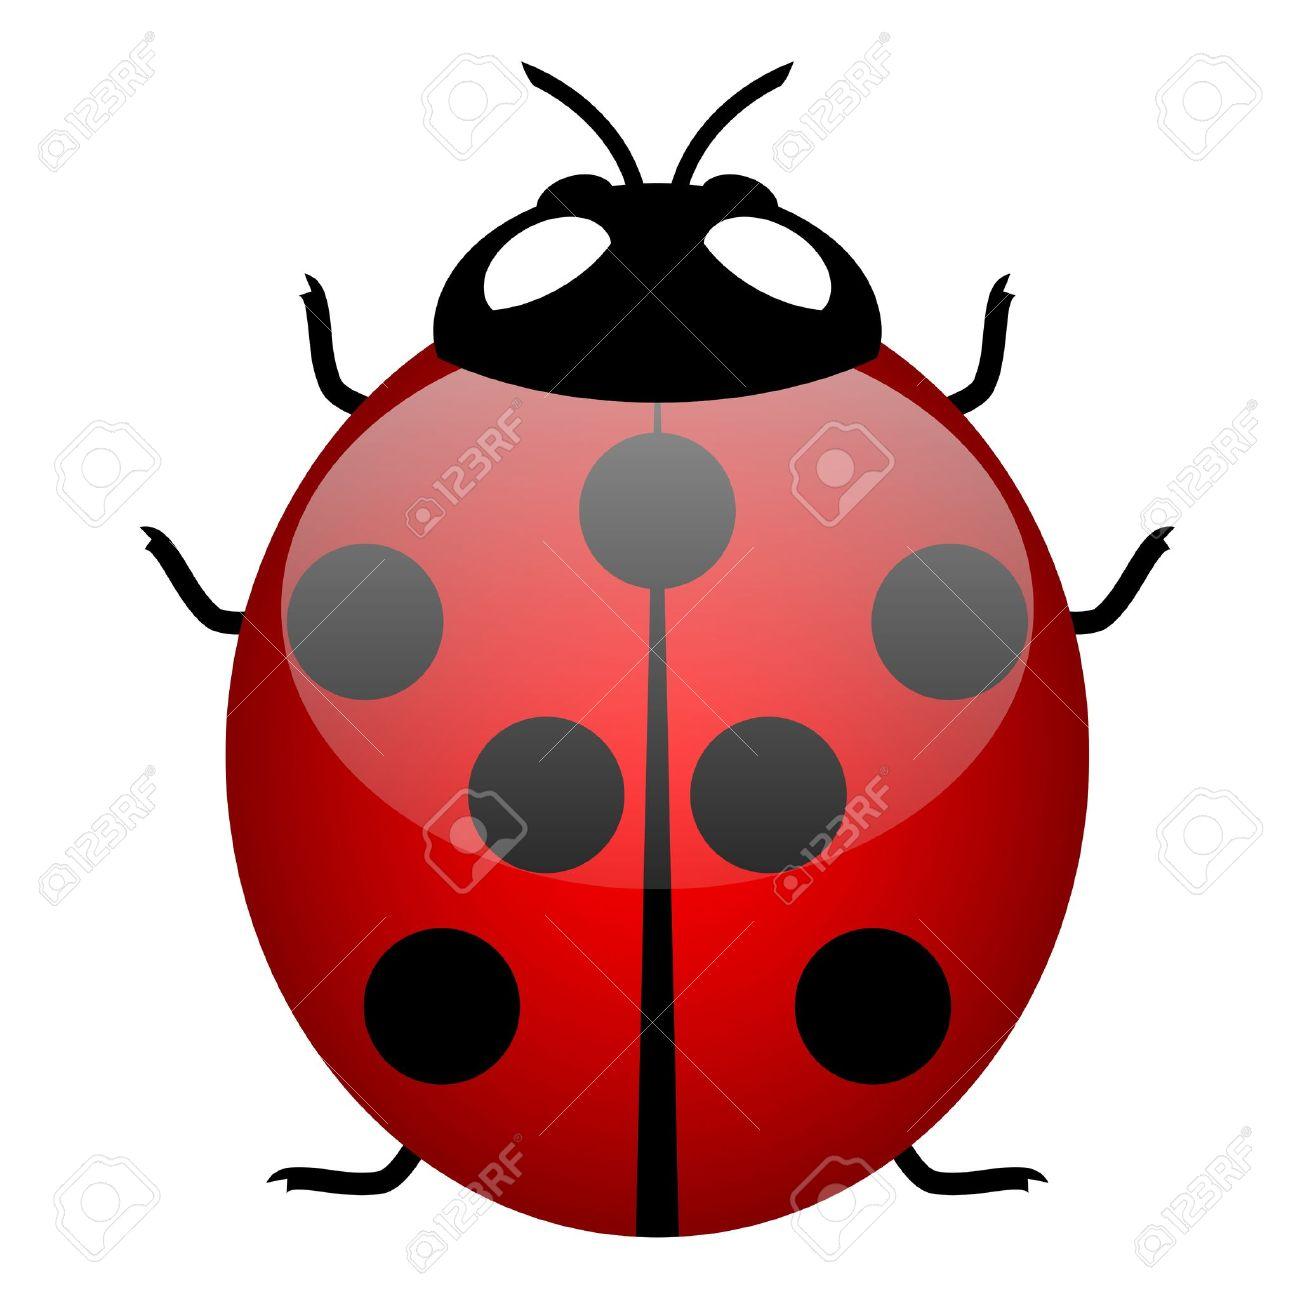 Illustration of ladybird (symbol of good luck) Stock Vector - 14646098